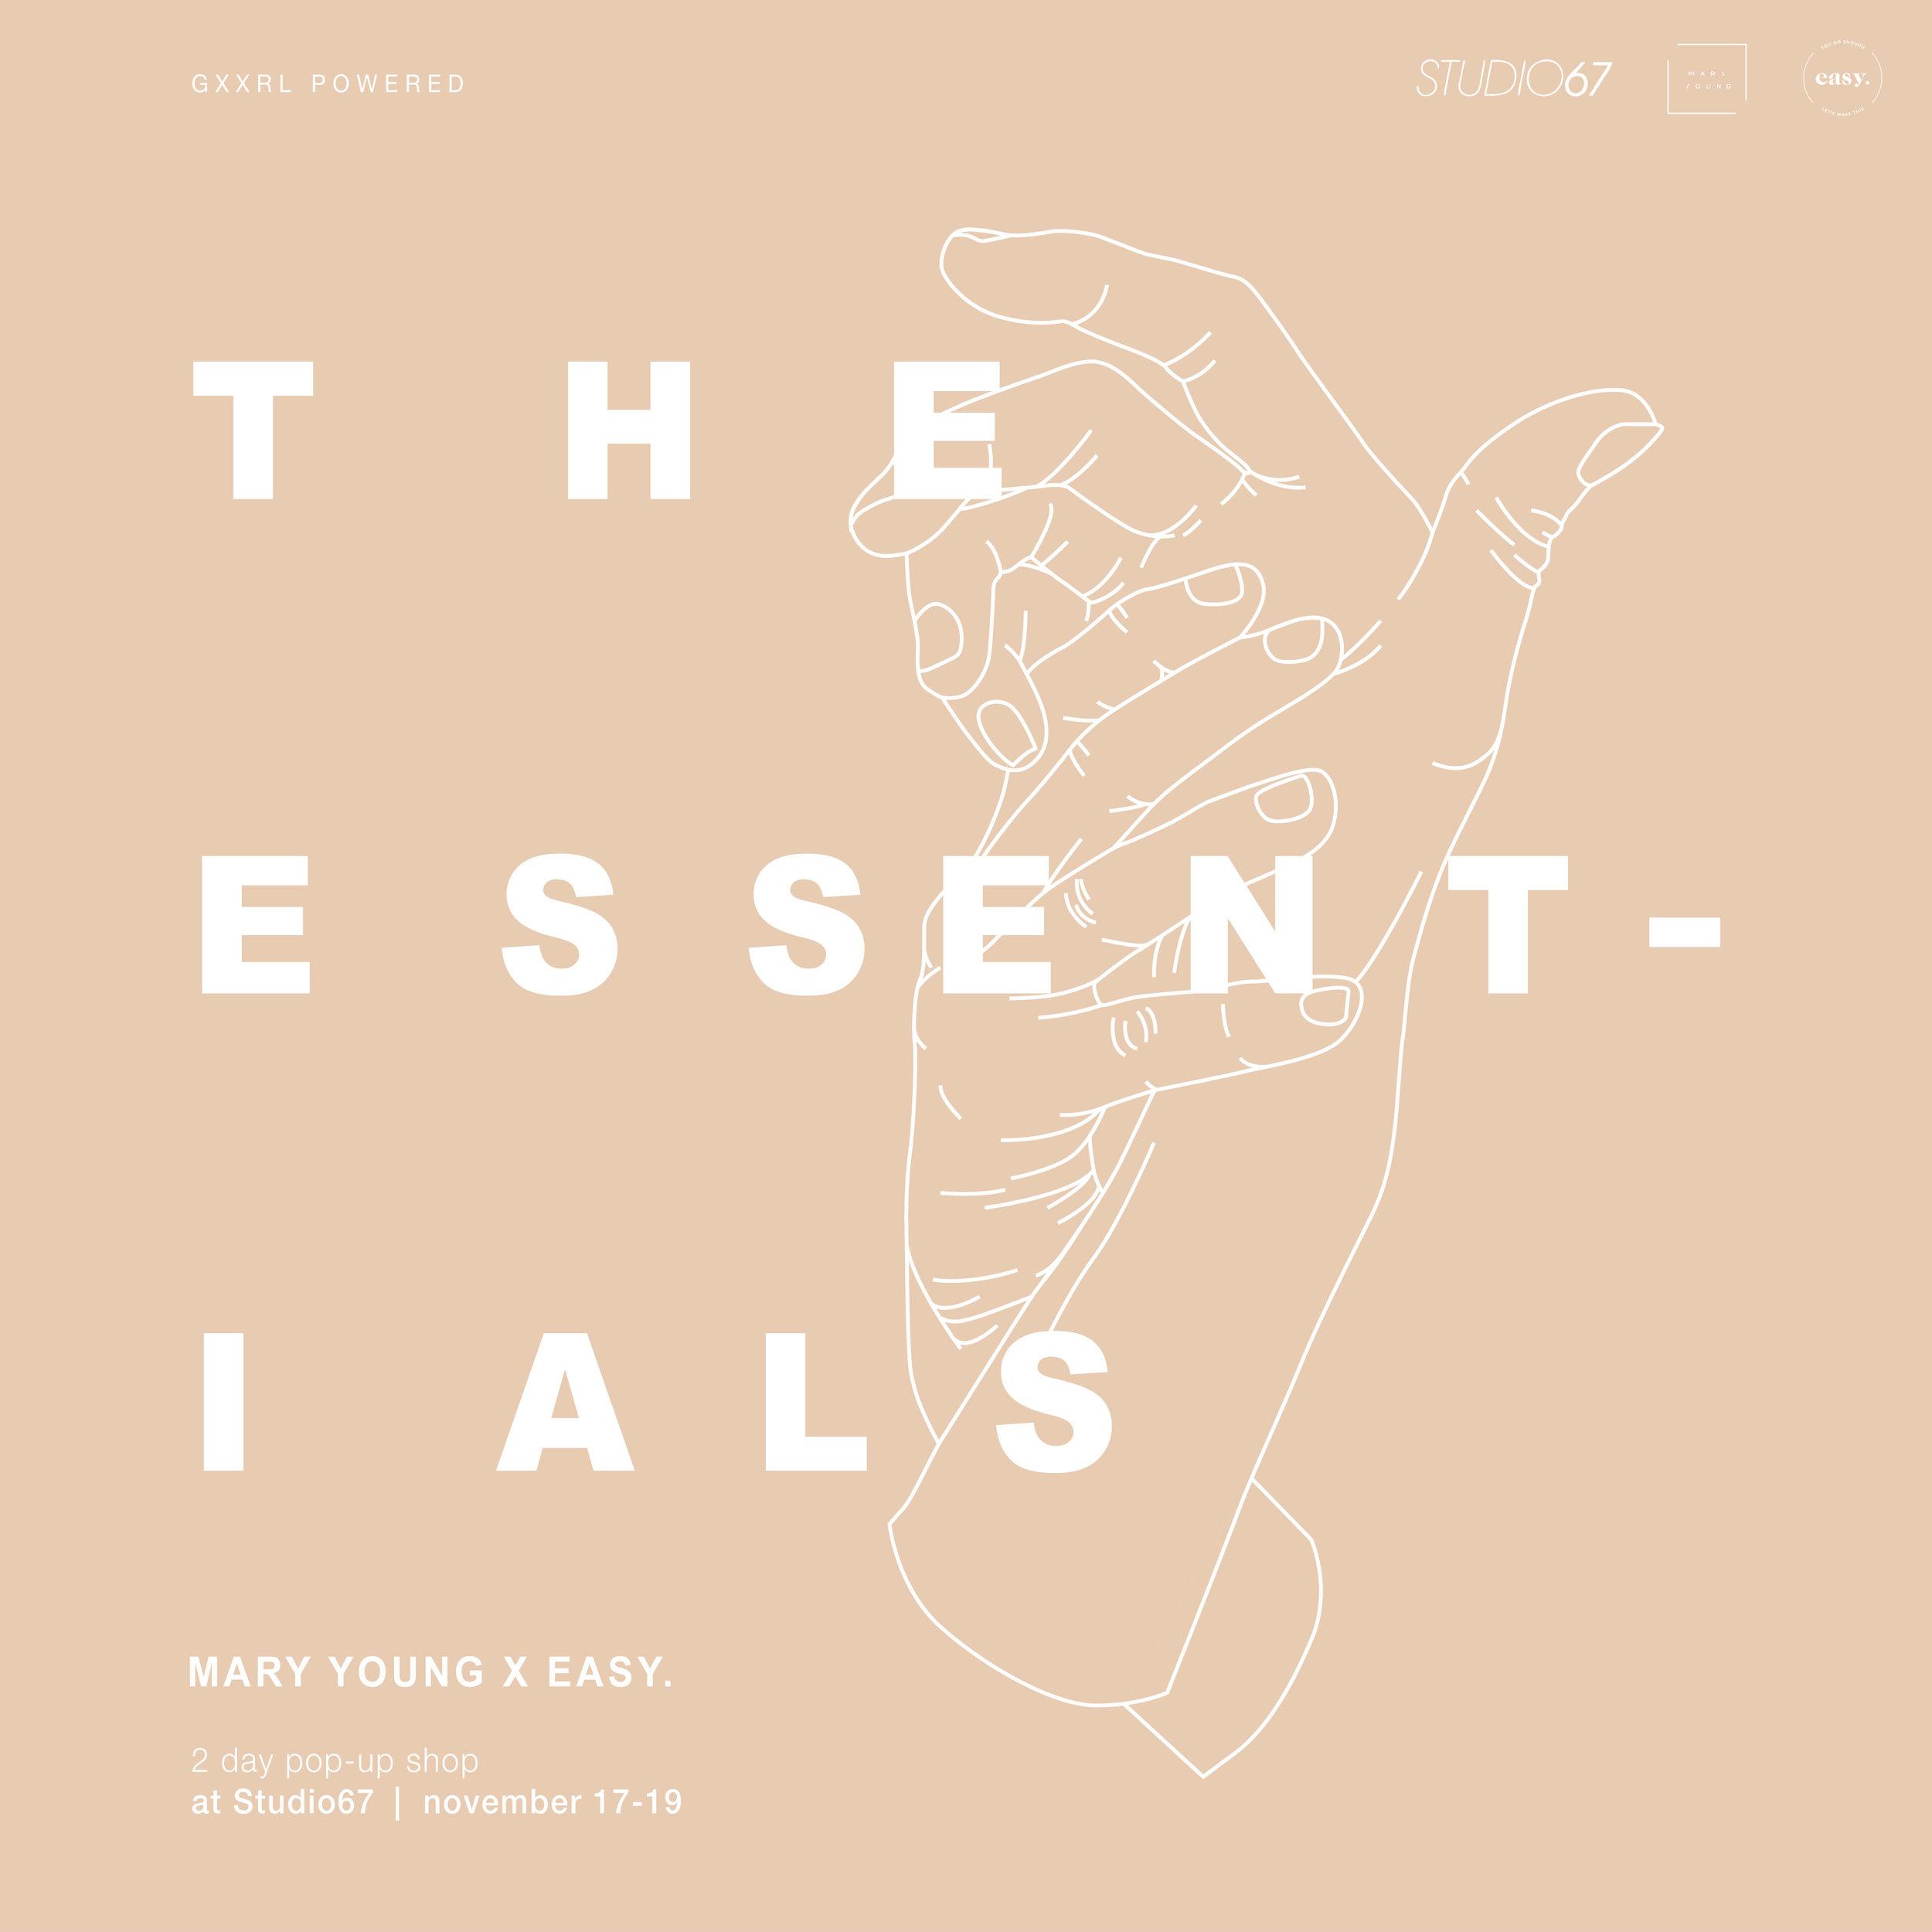 essentials-insta-edit2.jpg